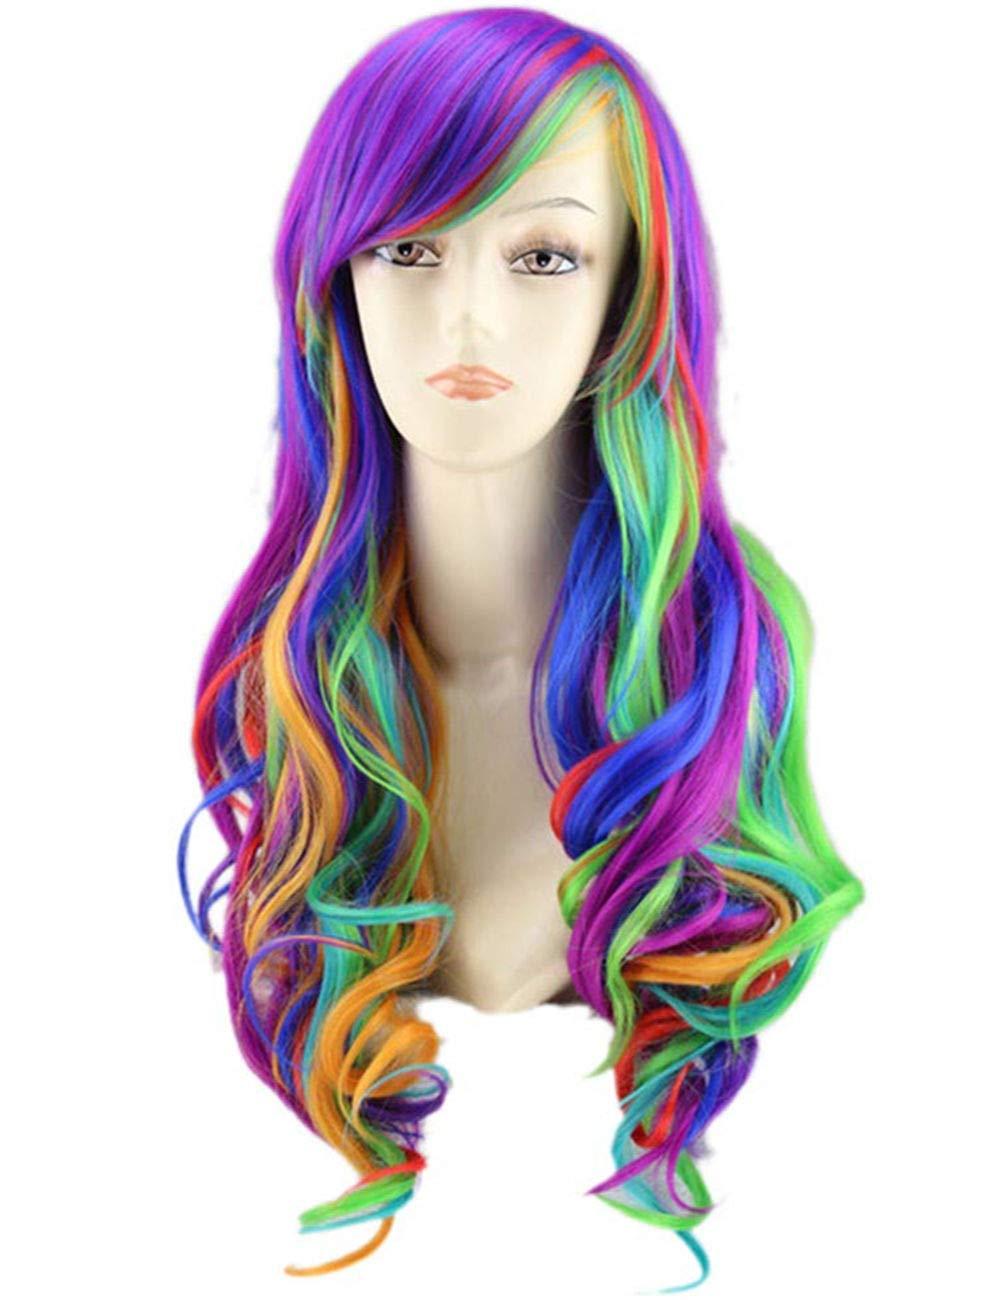 "TopWigy Women Anime Cosplay Wig Rainbow Wigs Long Curly Wave Harajuku Style Rainbow Hair Party Costume Lolita Wig (Rainbow 26"")"